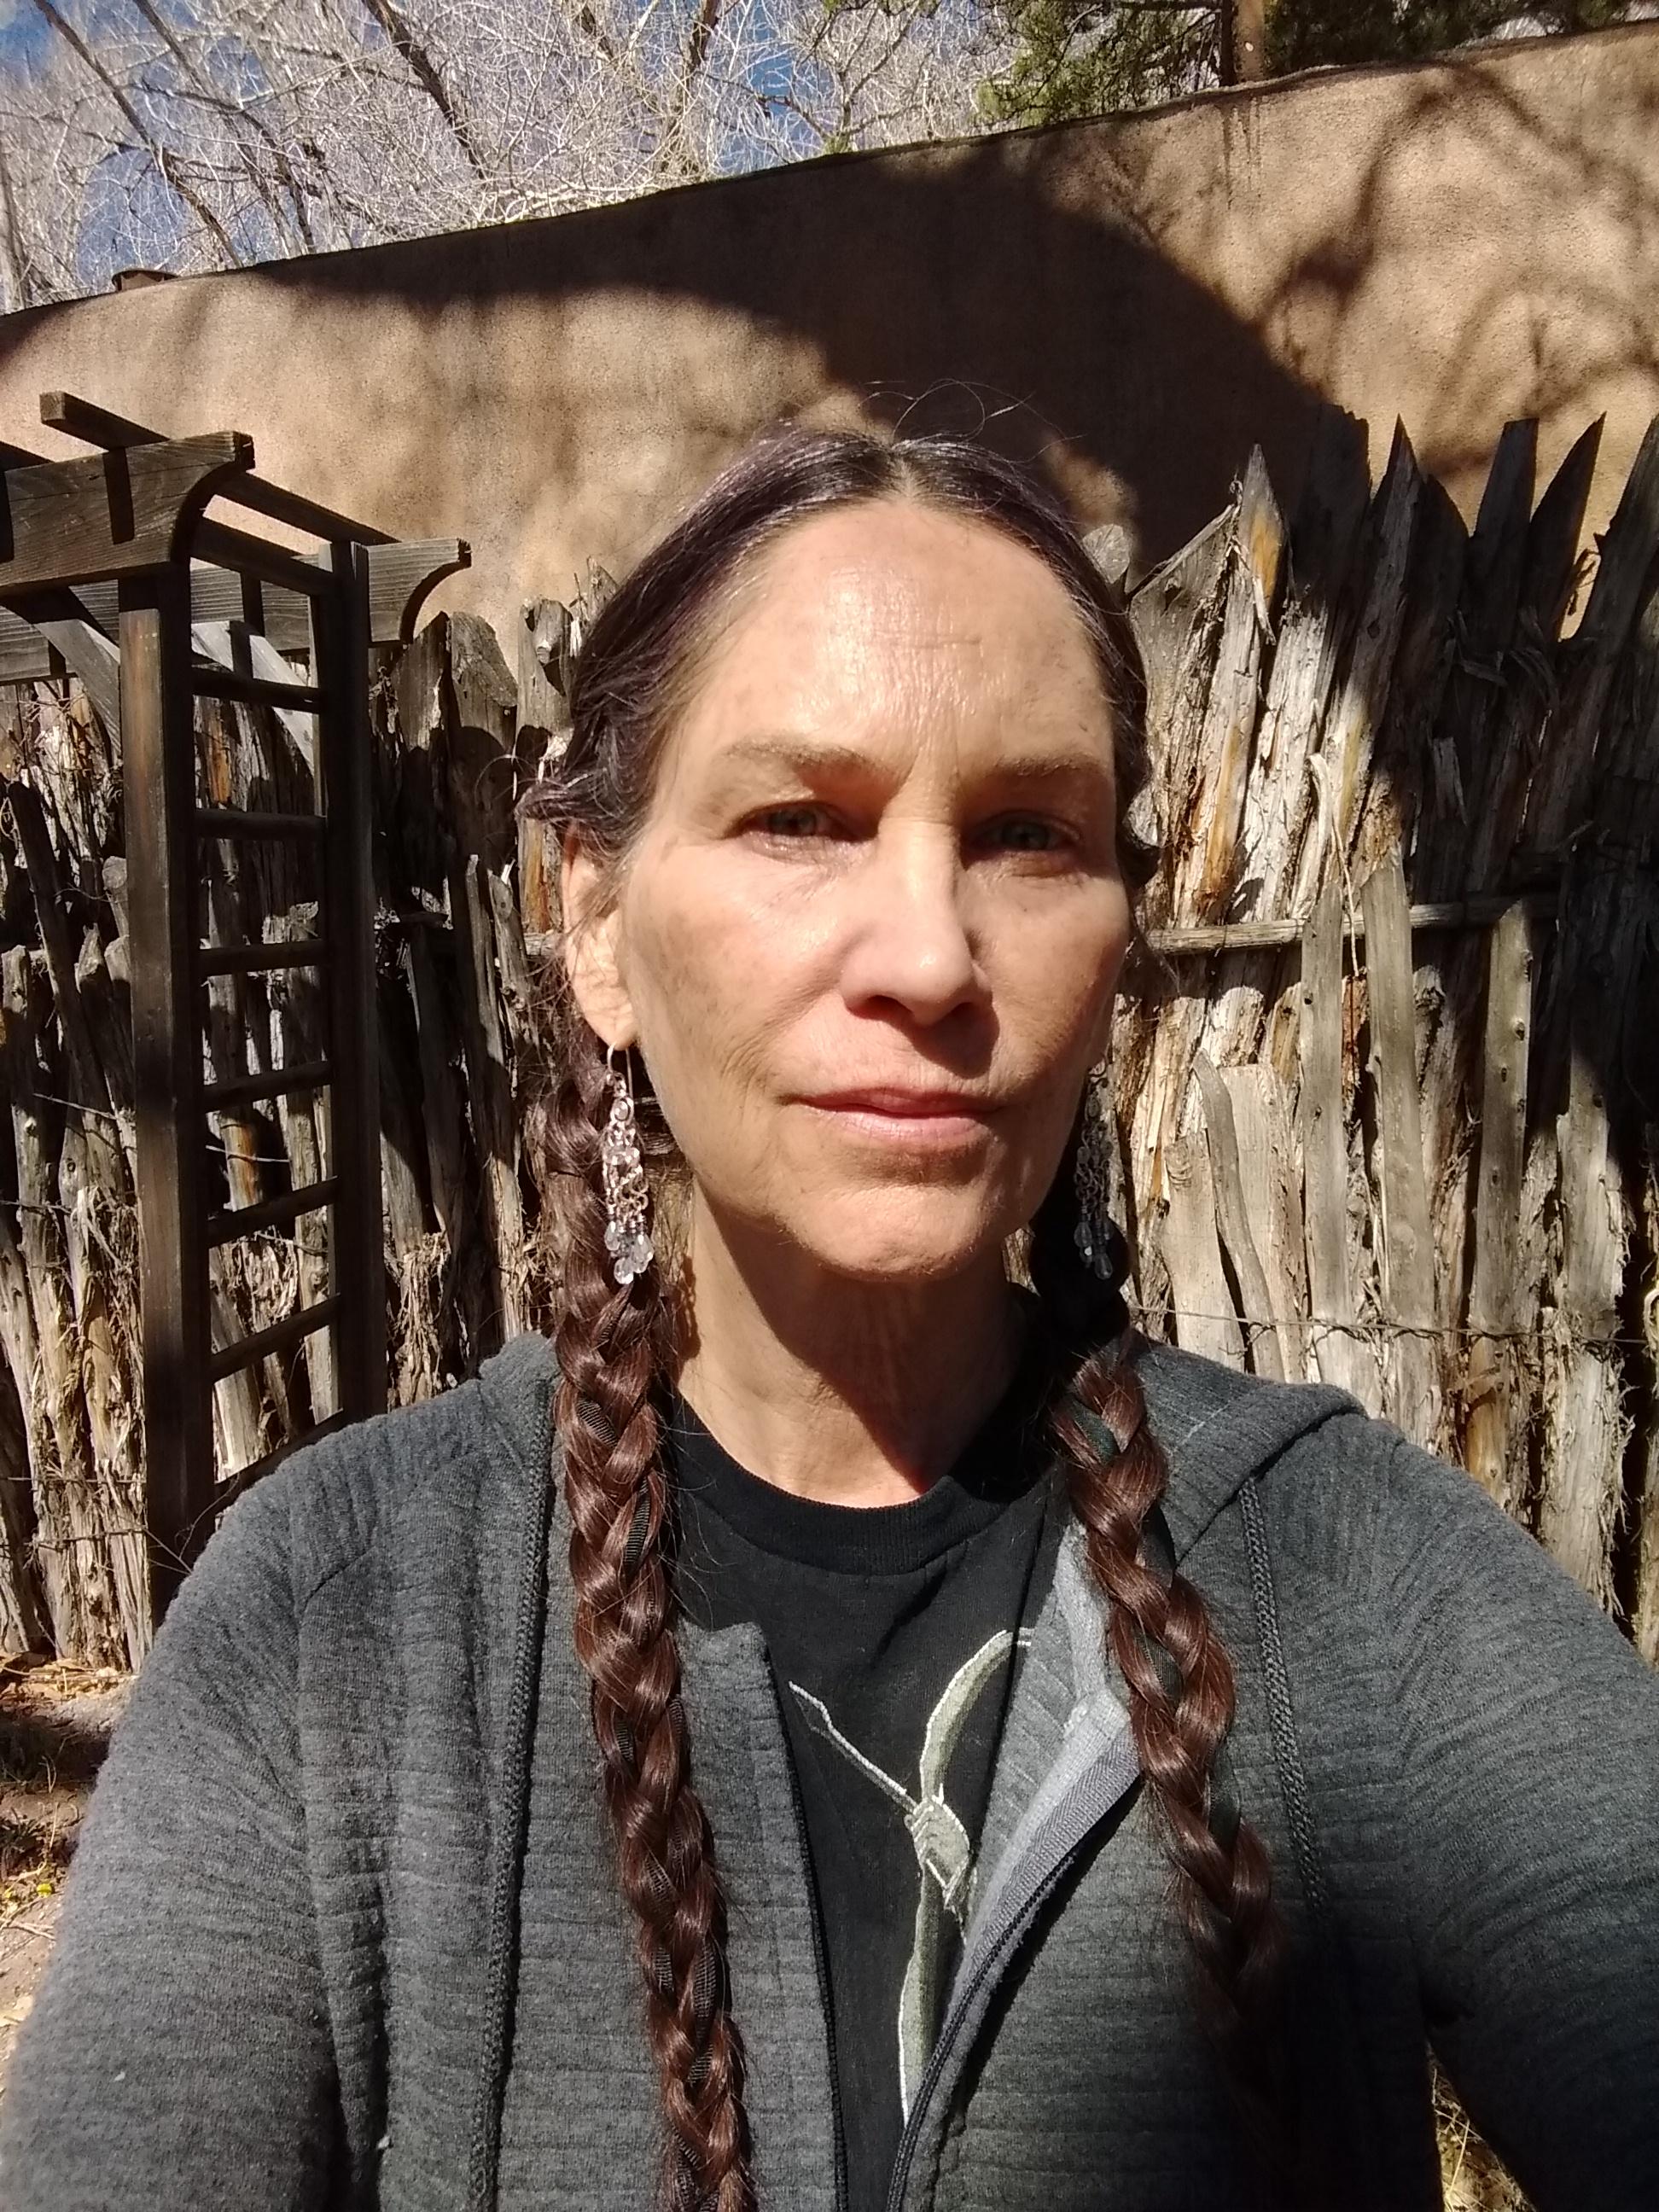 Cynthia Perzabal